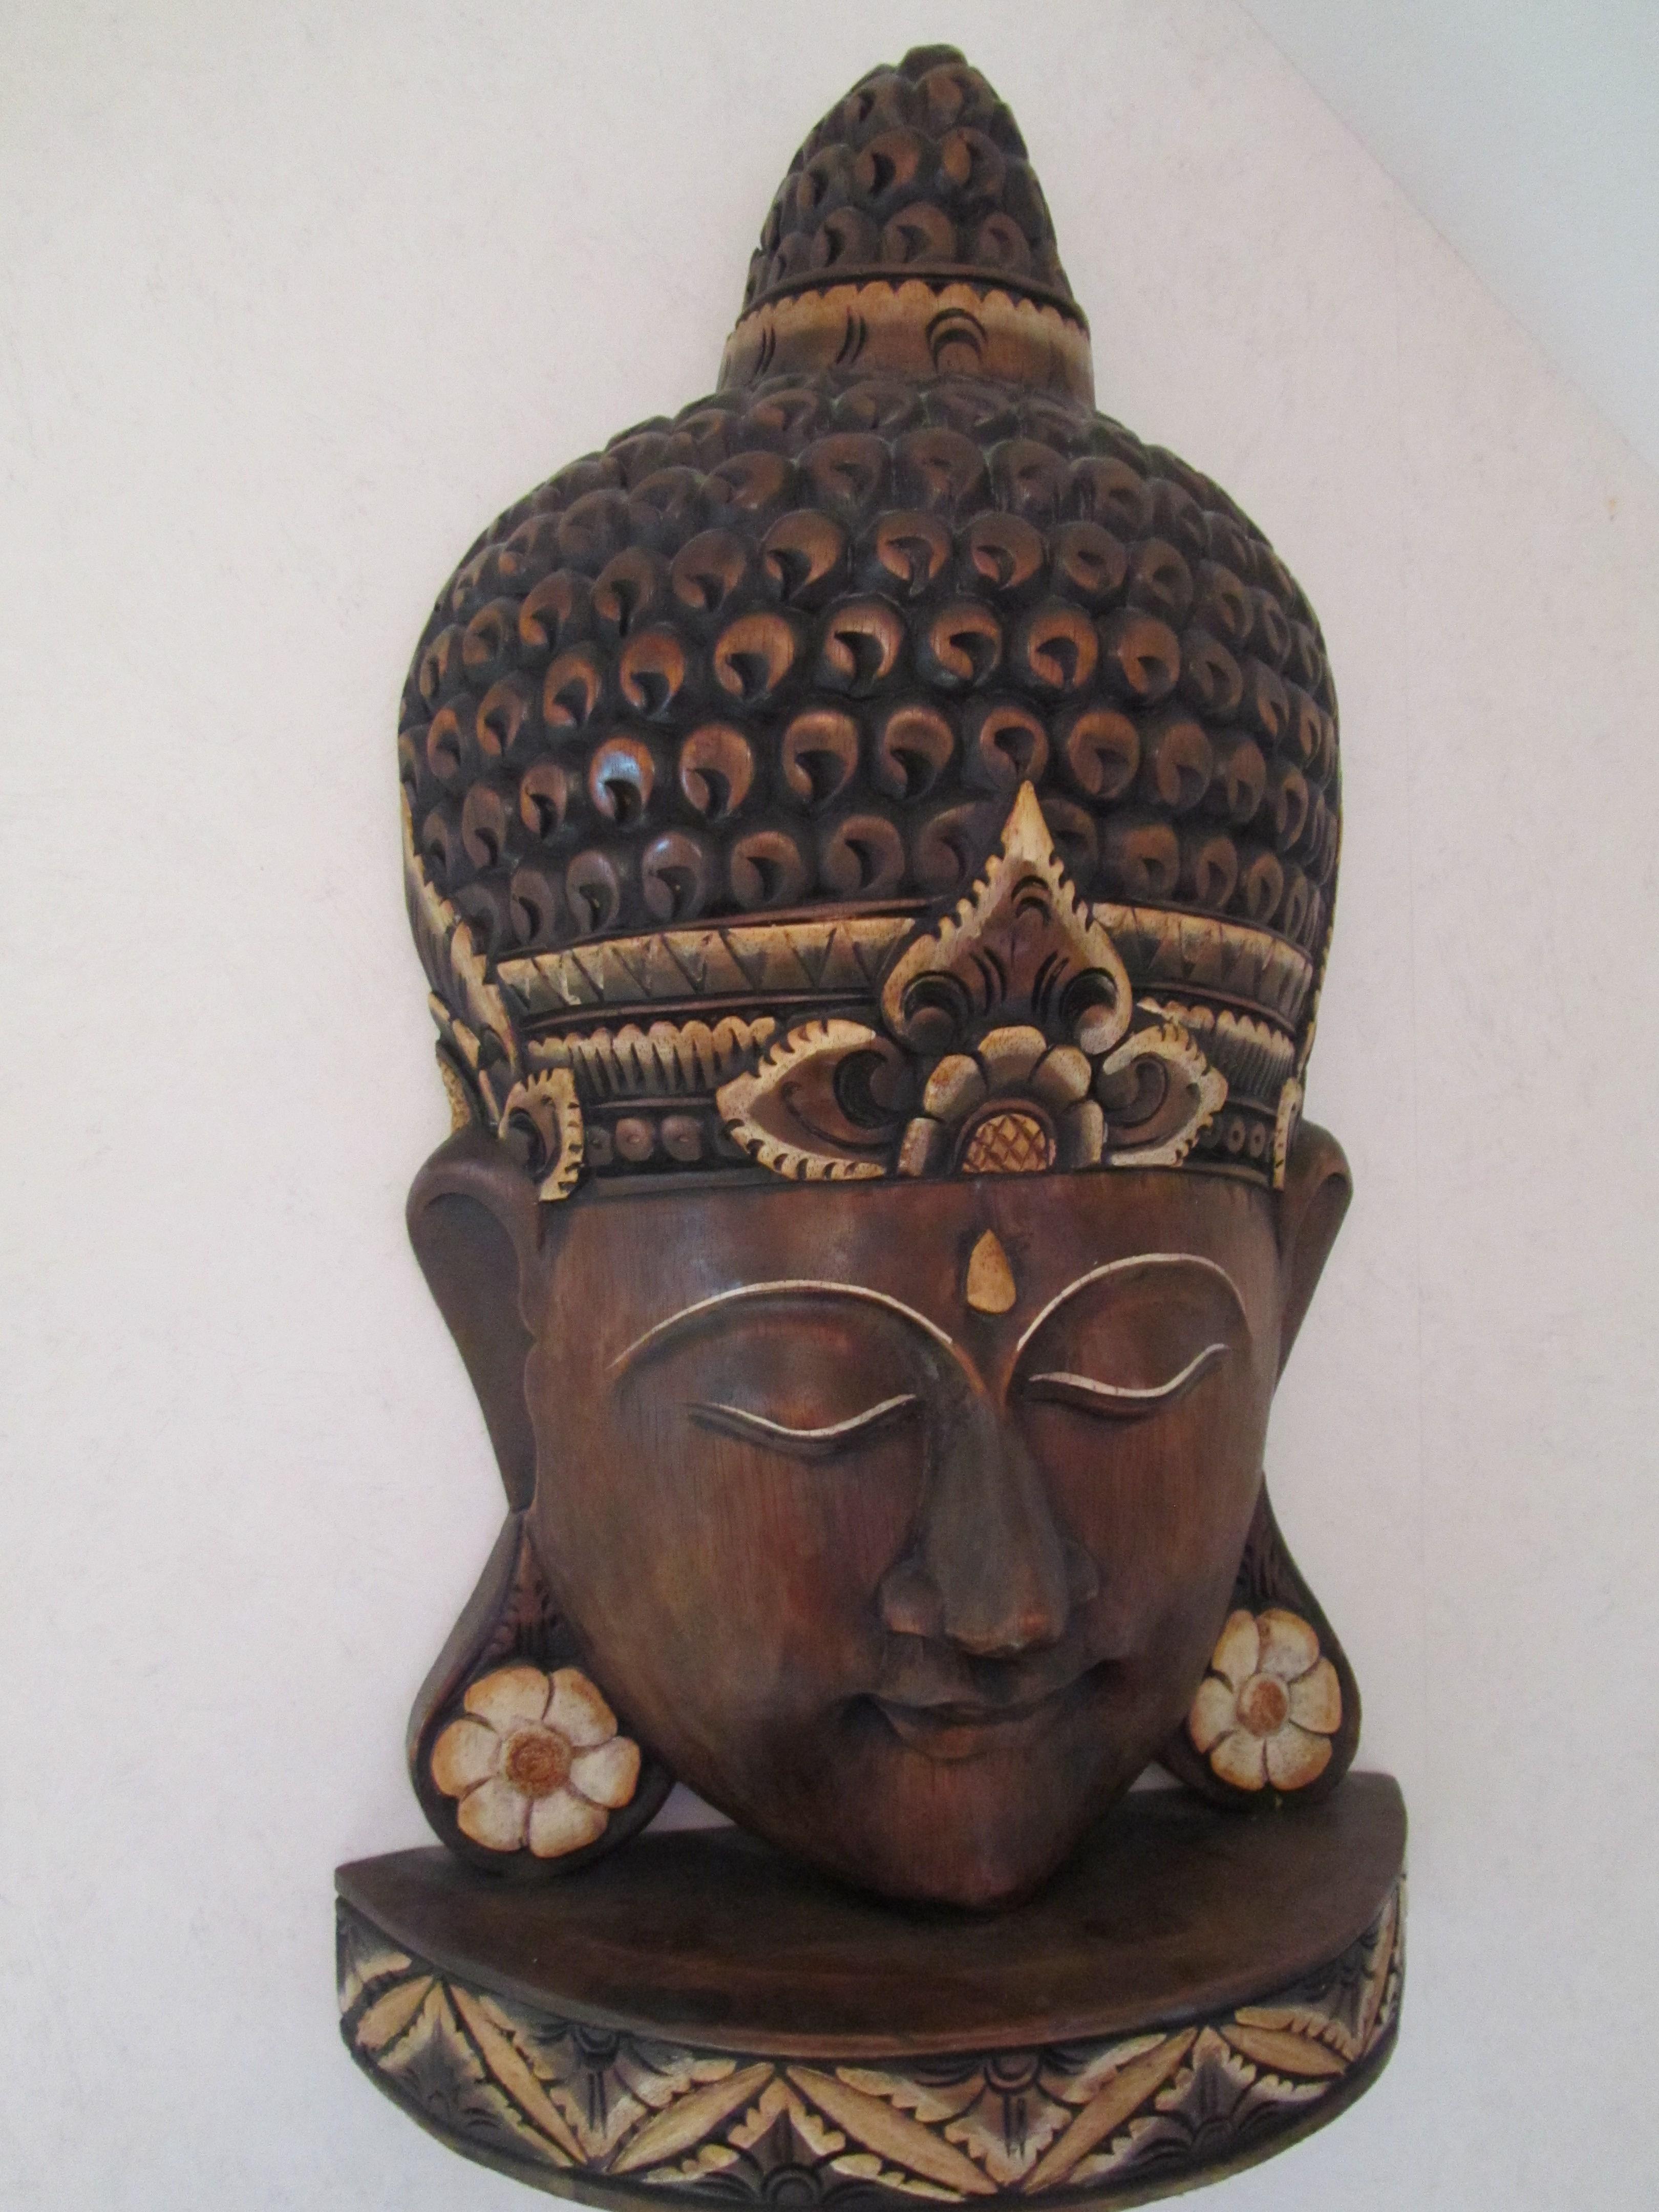 guérande la baule massage shiatsu reflexologie bien être cadeau zen 8